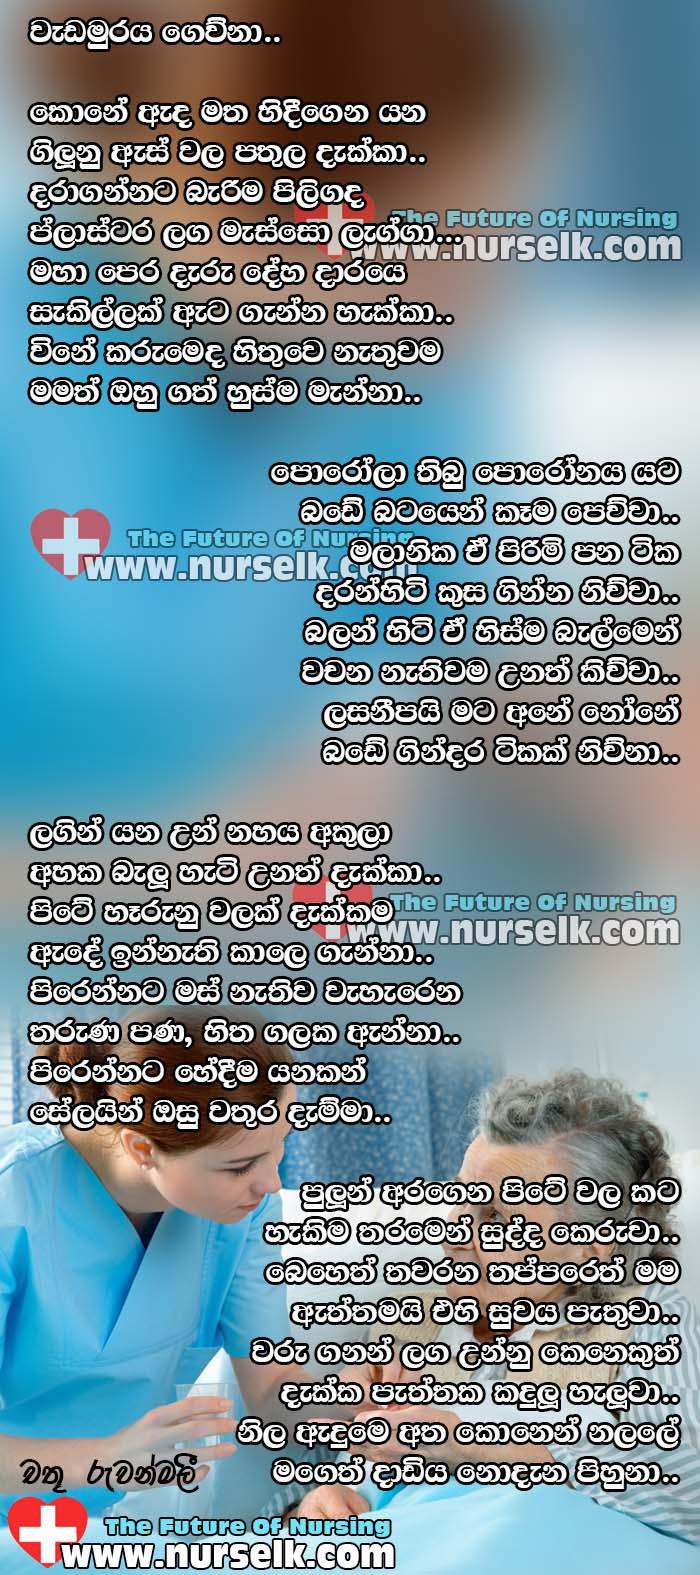 Nursing Quotes Nursing Quotes The Nurse Www.nurselk